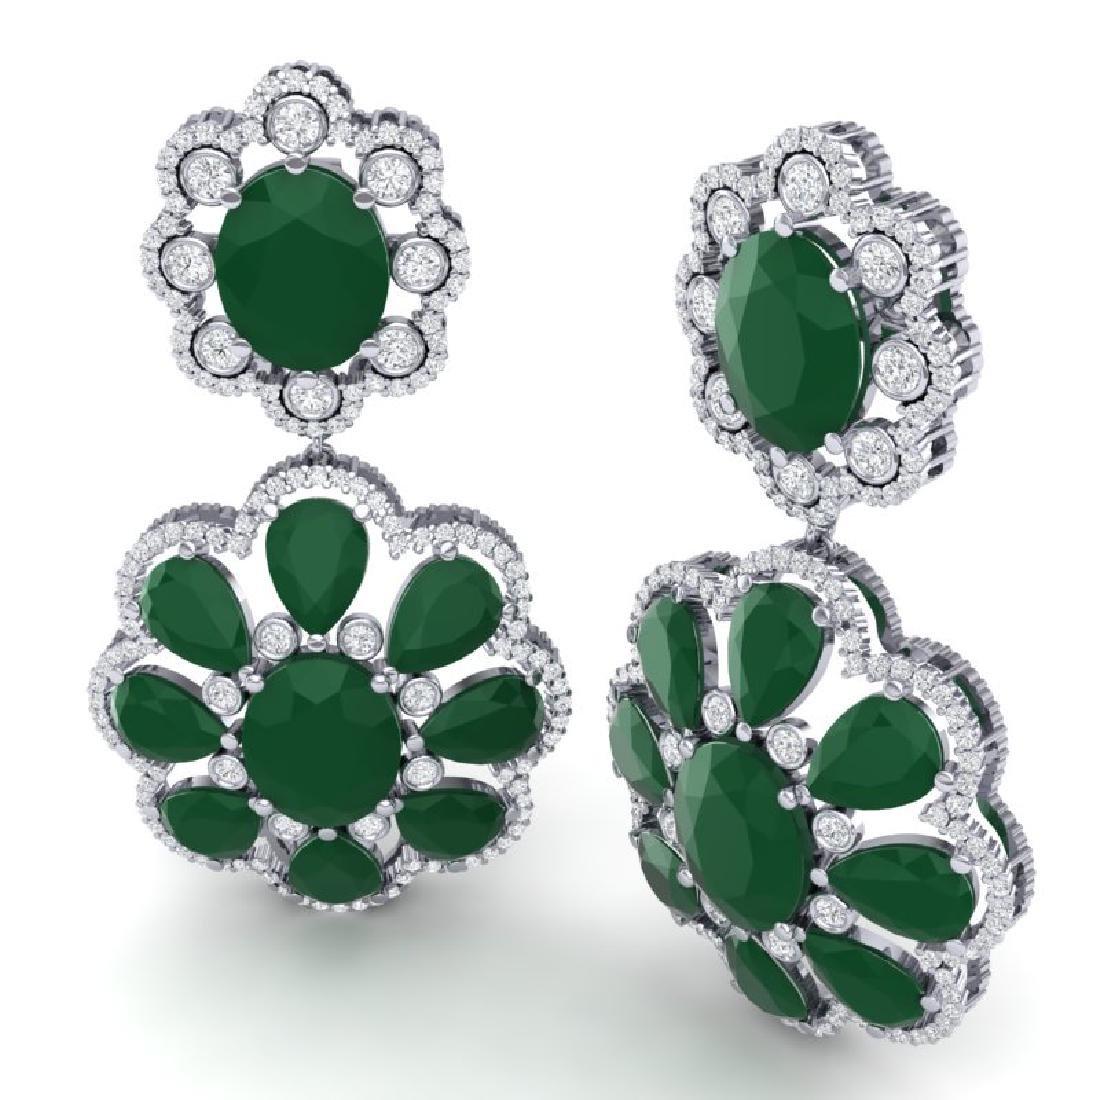 33.88 CTW Royalty Emerald & VS Diamond Earrings 18K - 3